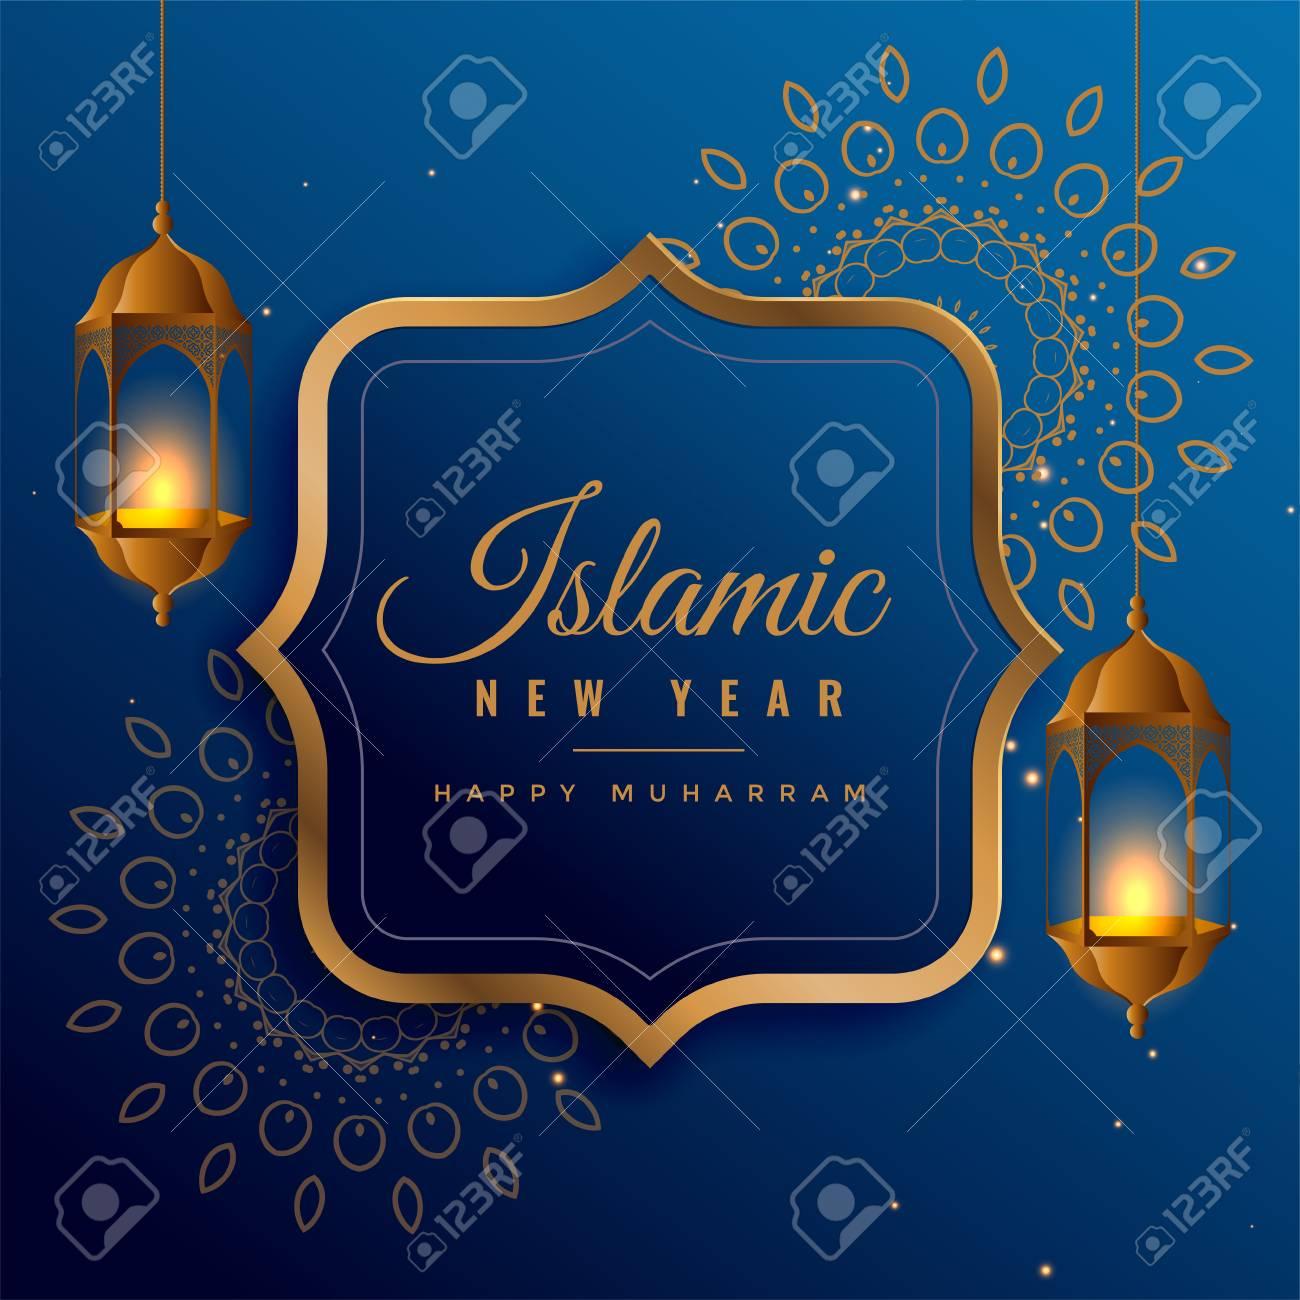 creative islamic new year design with hanging lanterns - 106857770